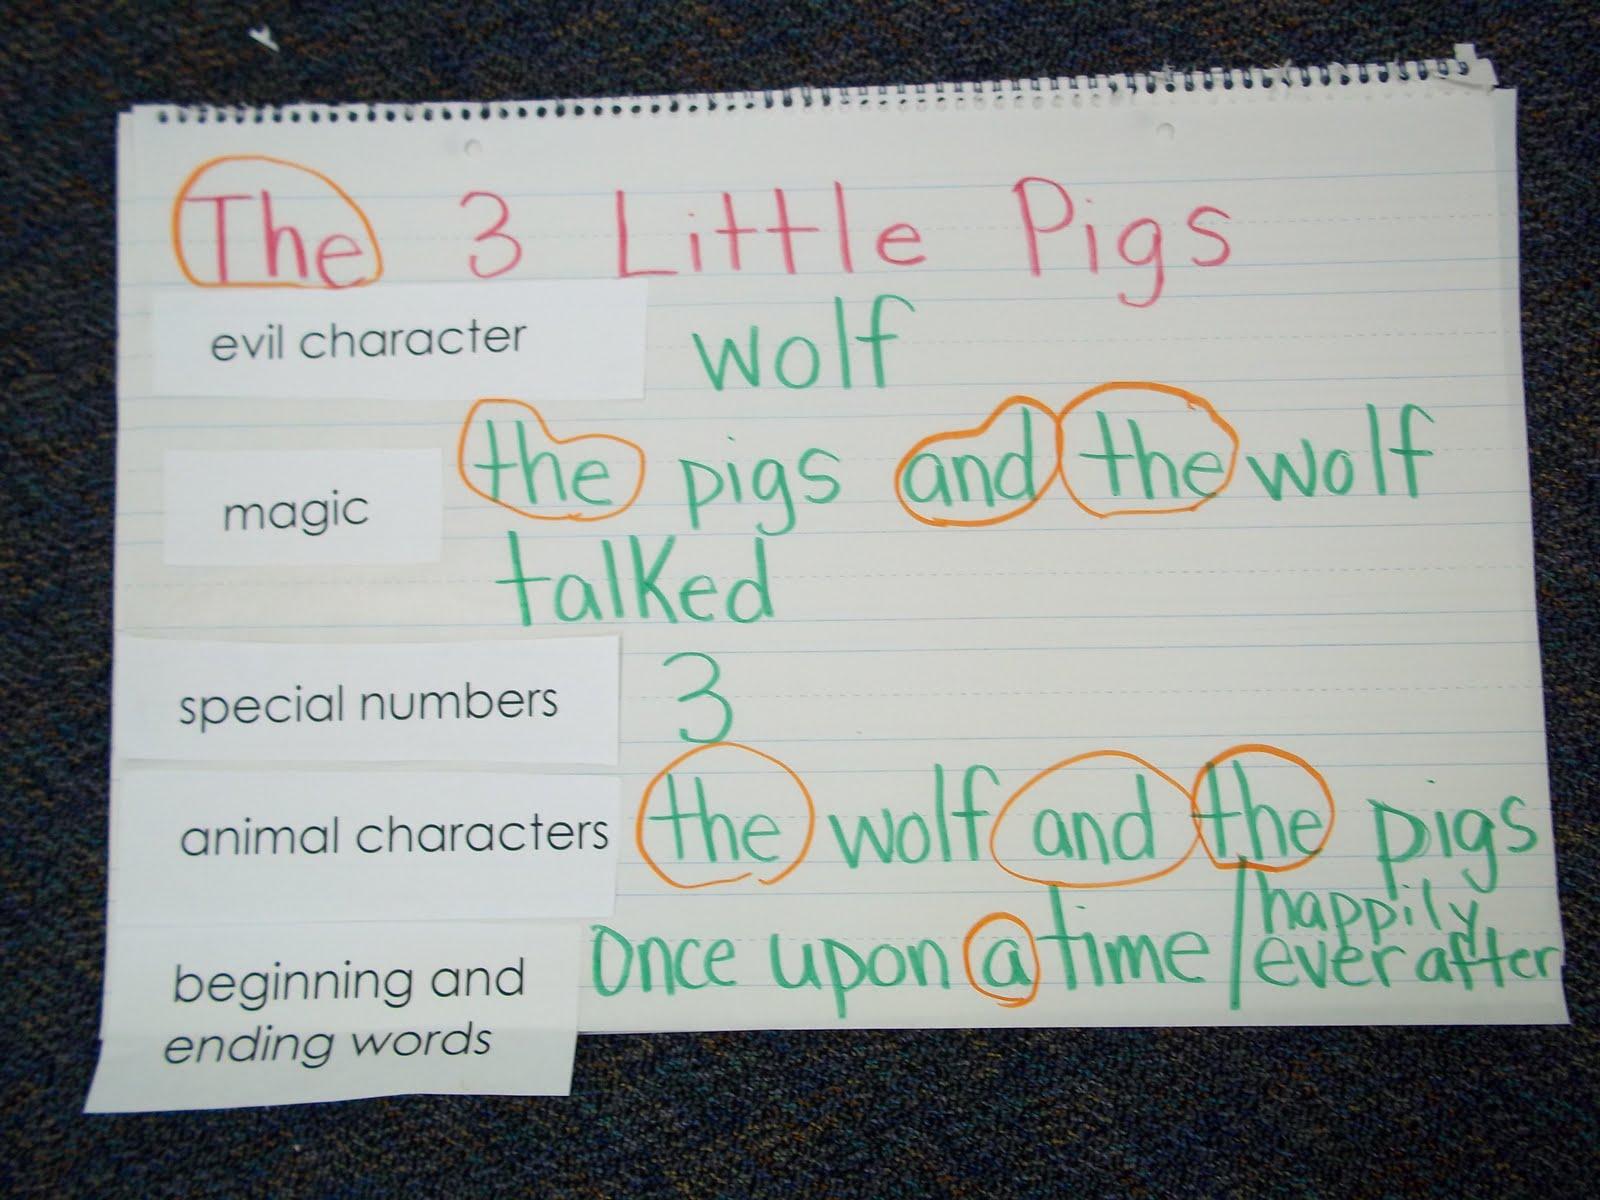 Kinder Garden: Mrs. Wood's Kindergarten Class: The Three Little Pigs